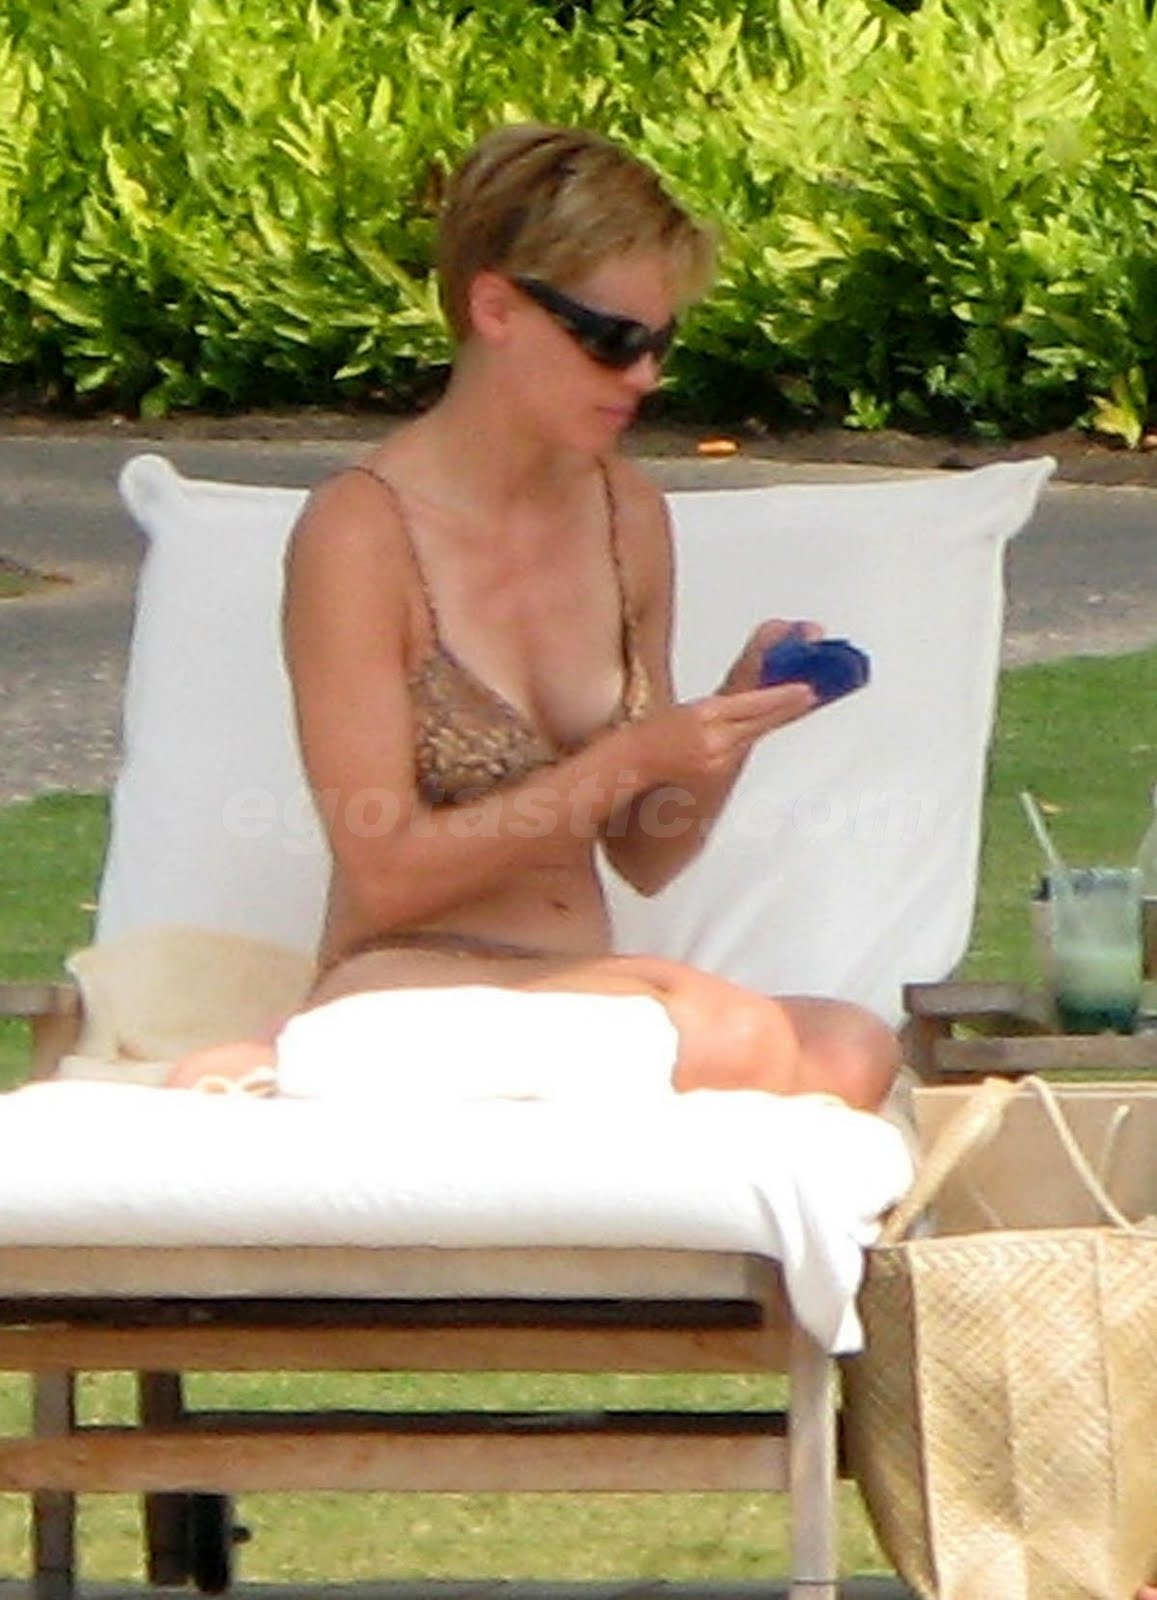 http://4.bp.blogspot.com/_3G4dg-GWVKI/TJNMvKnaxqI/AAAAAAAAH_g/THUtmzcQ_mY/s1600/11133_hilary-swank-bikini-1-04_123_656lo.jpg